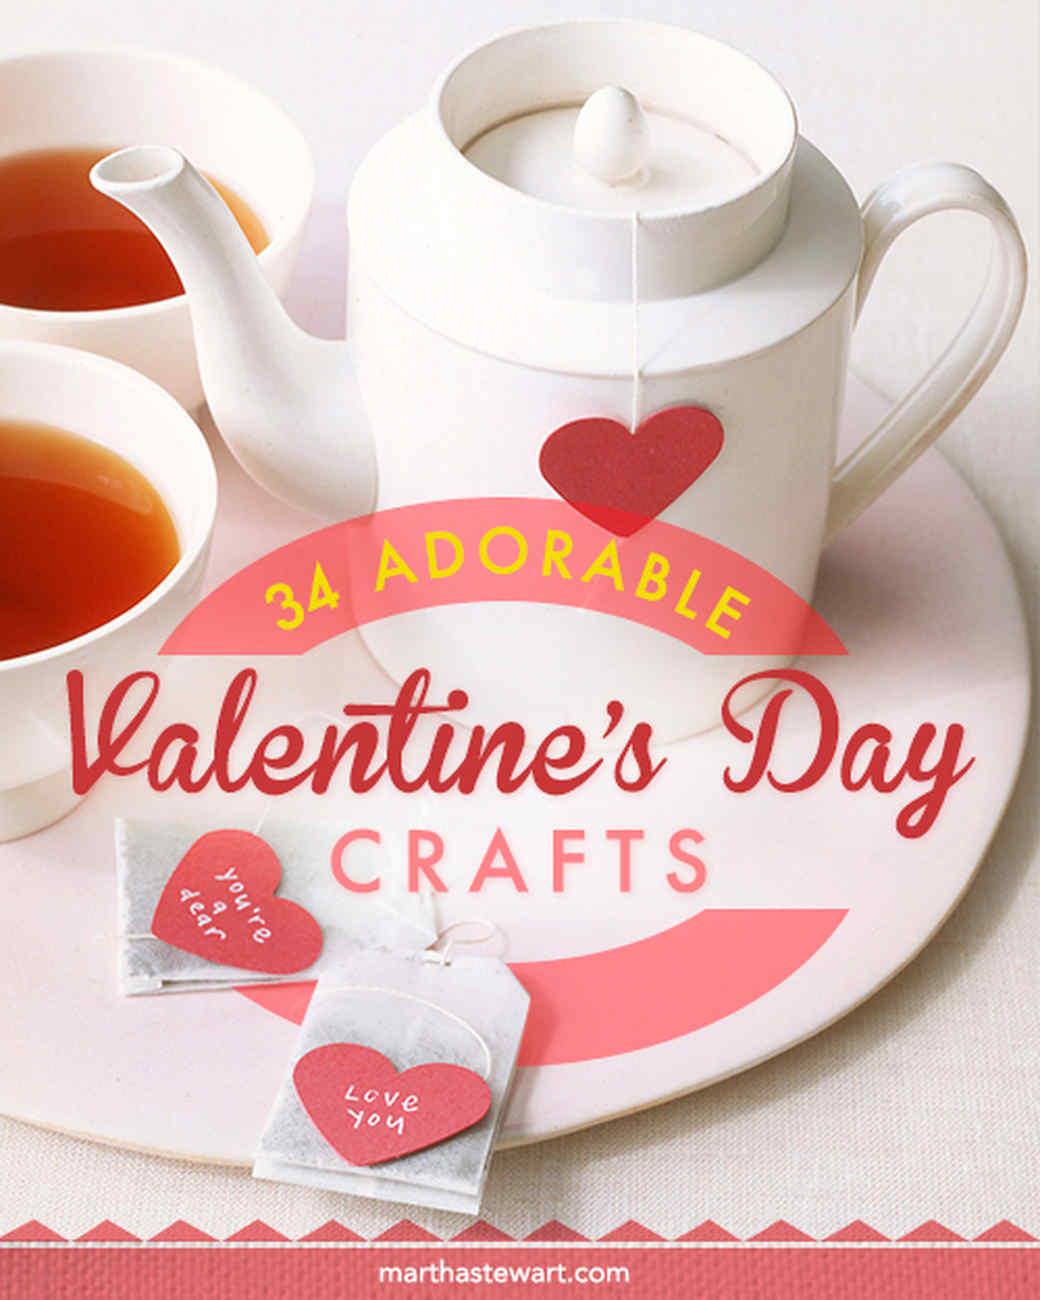 34-adorable-valentines-day-crafts-0115.jpg